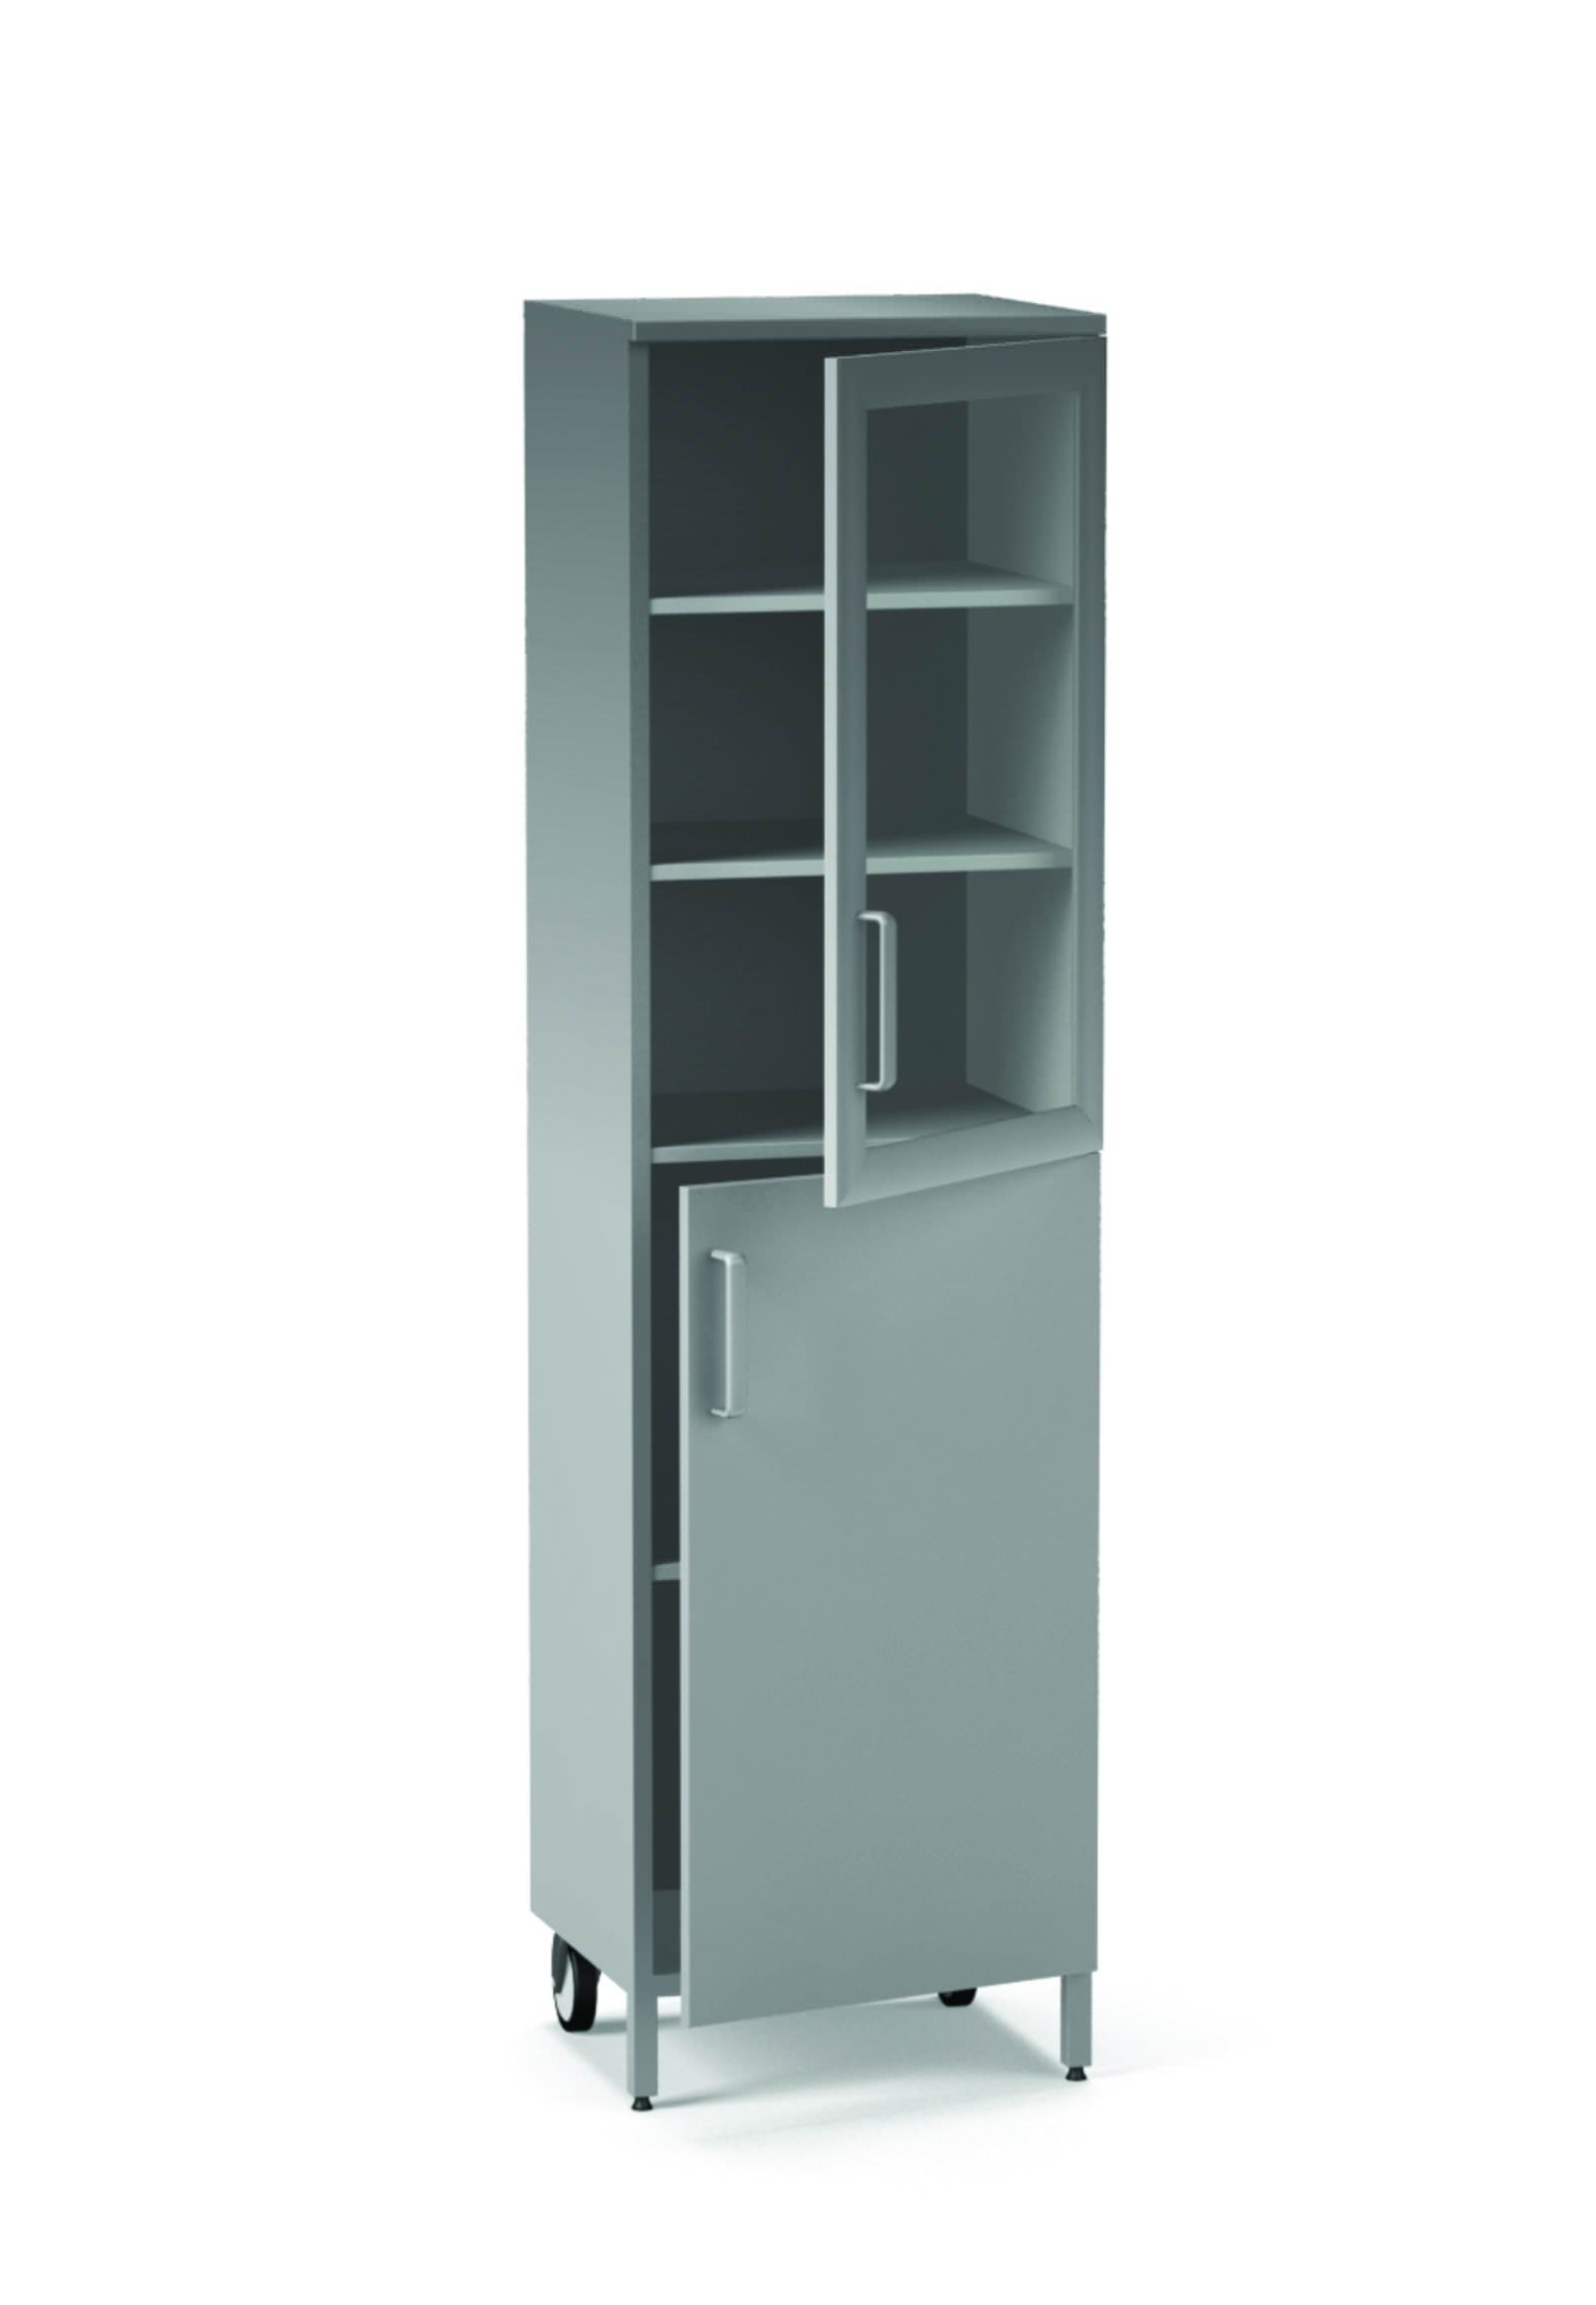 Шкаф медицинский ДМ-6-001-03